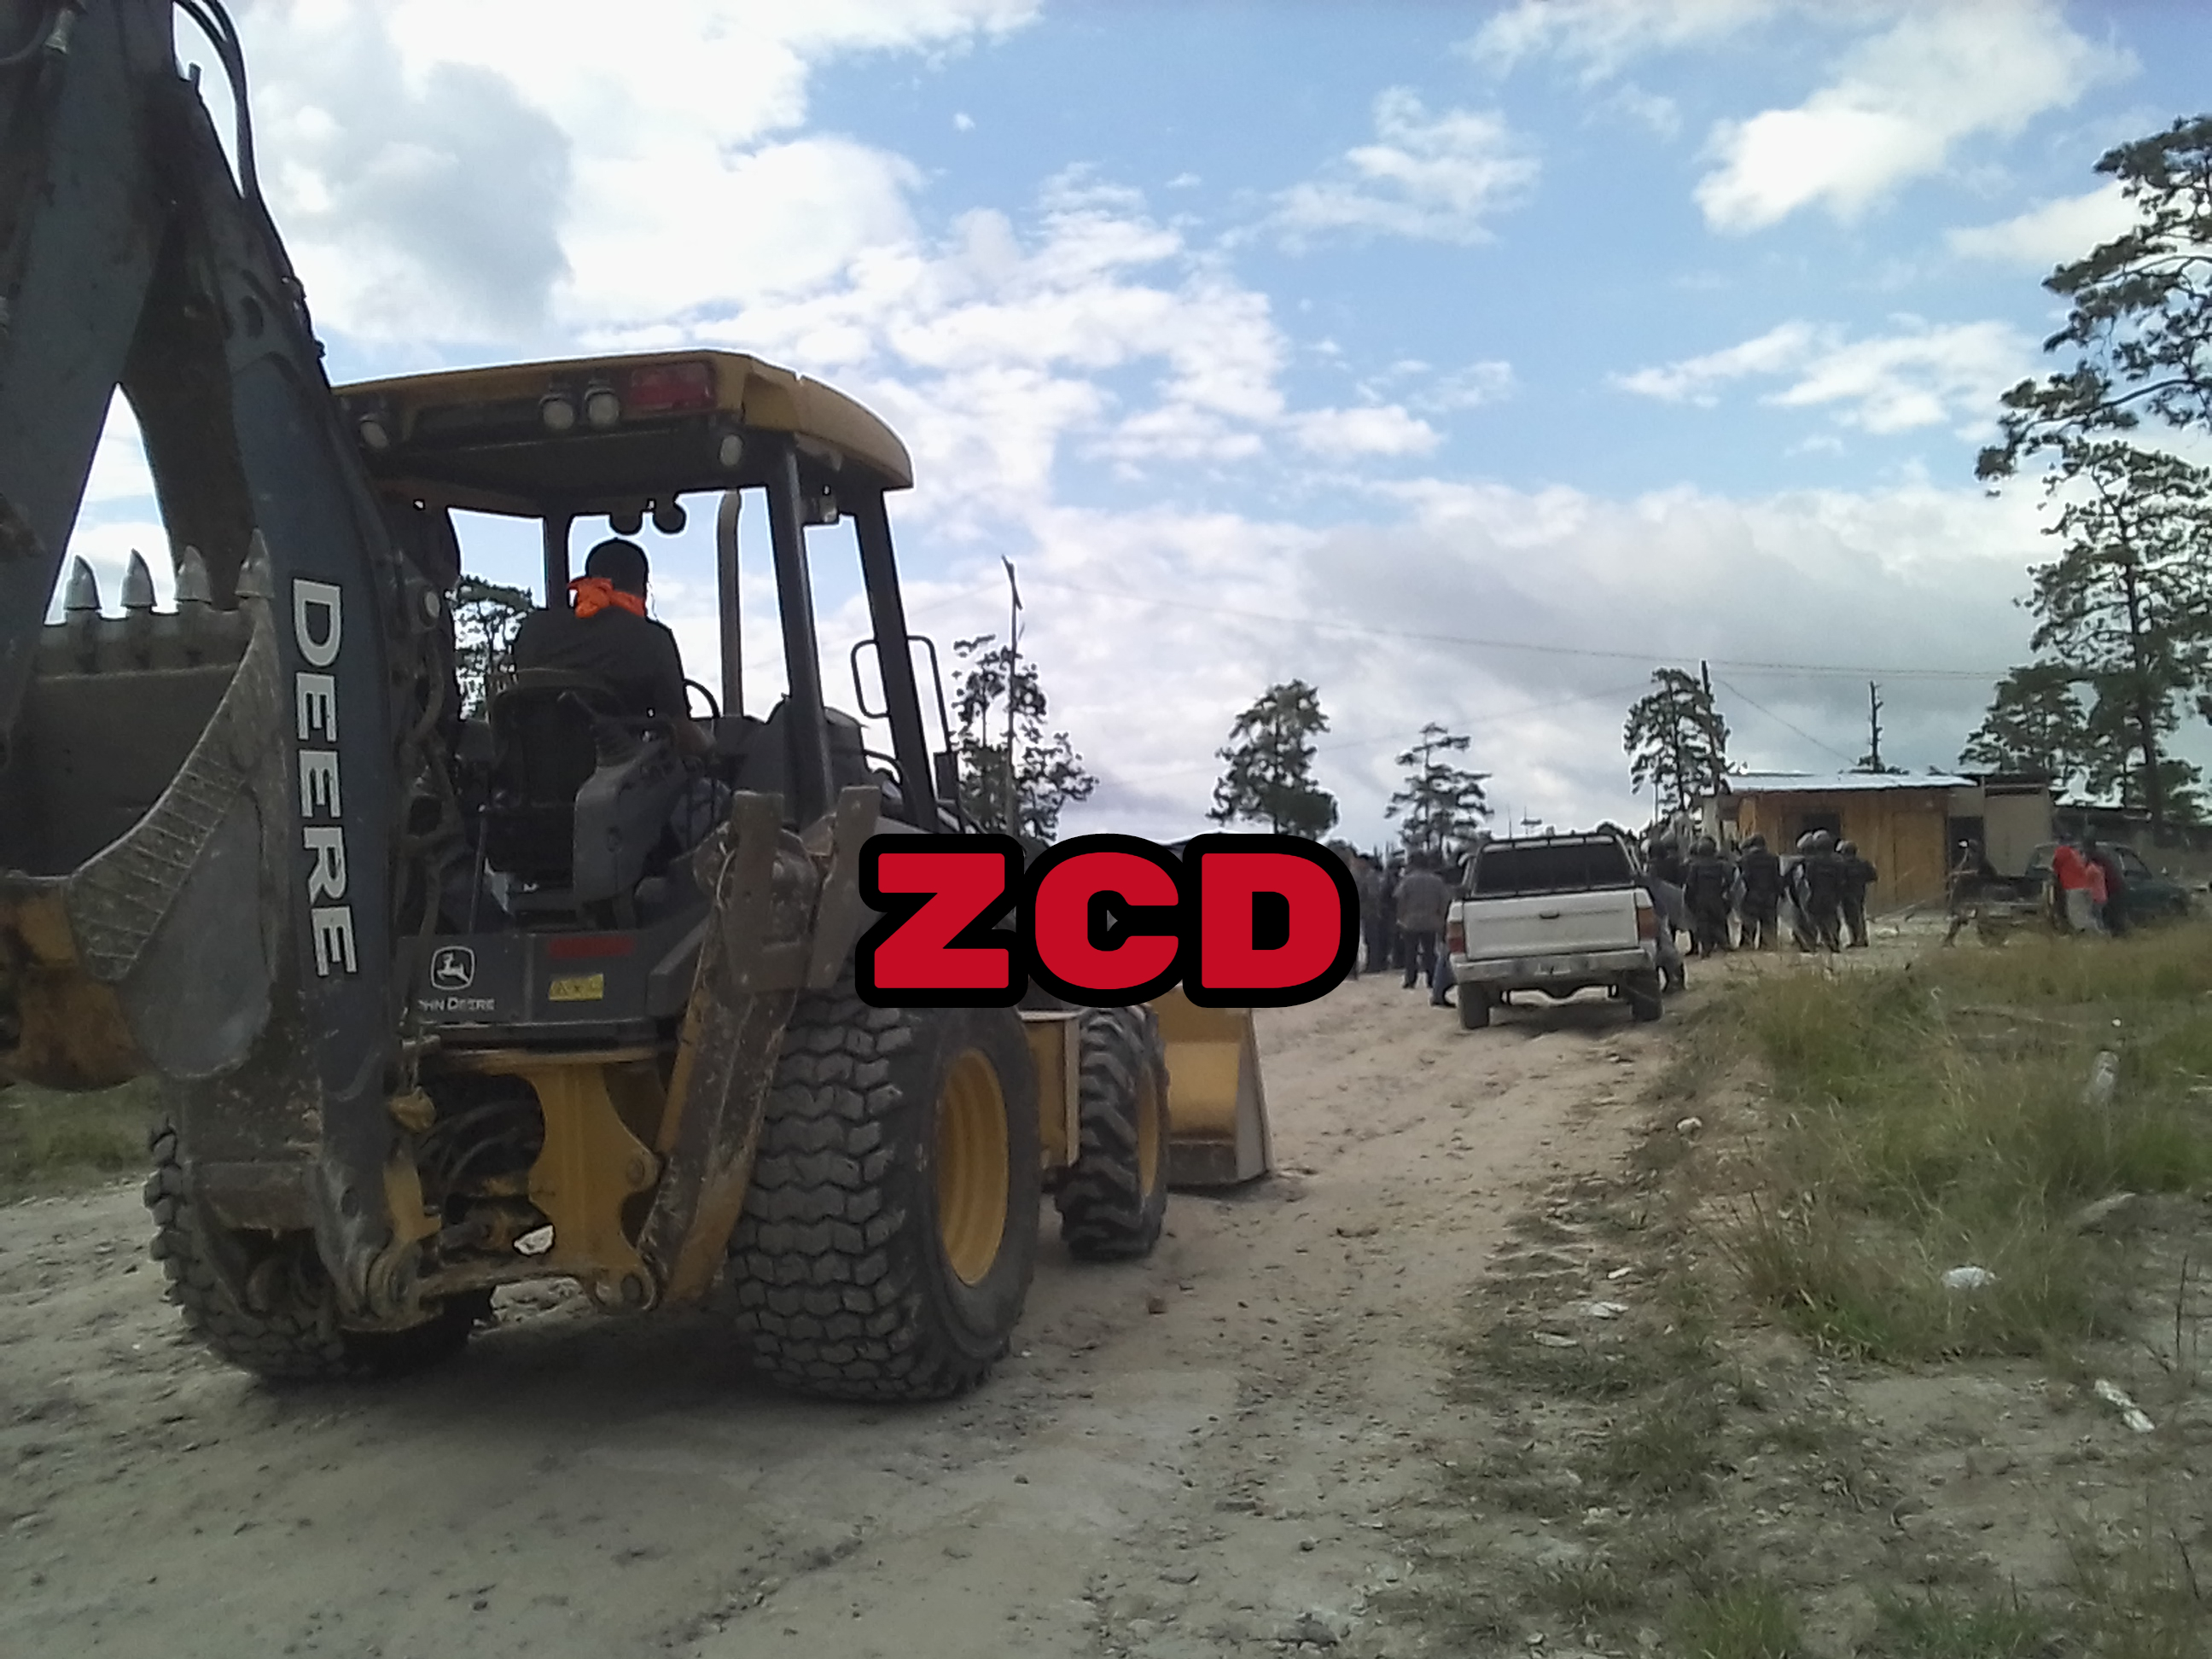 Desalojan 47 familias de la colonia Jericó en Siguatepeque